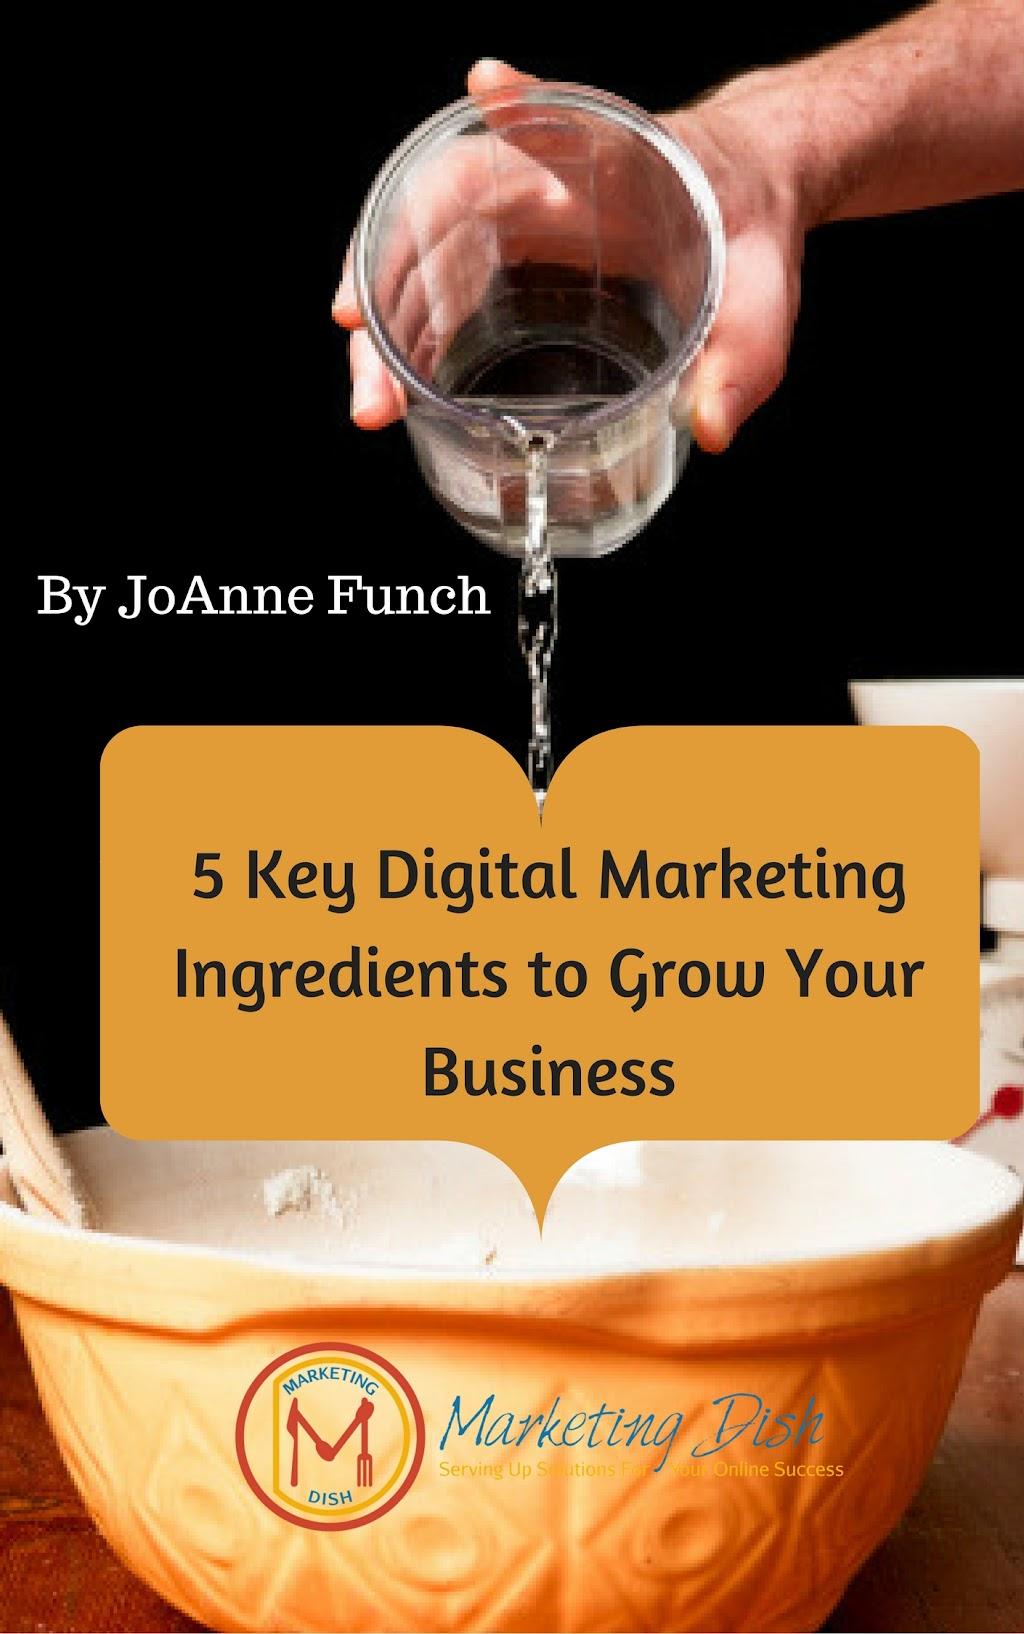 5 Key Digital Marketing Ingredients to Grow Your Business